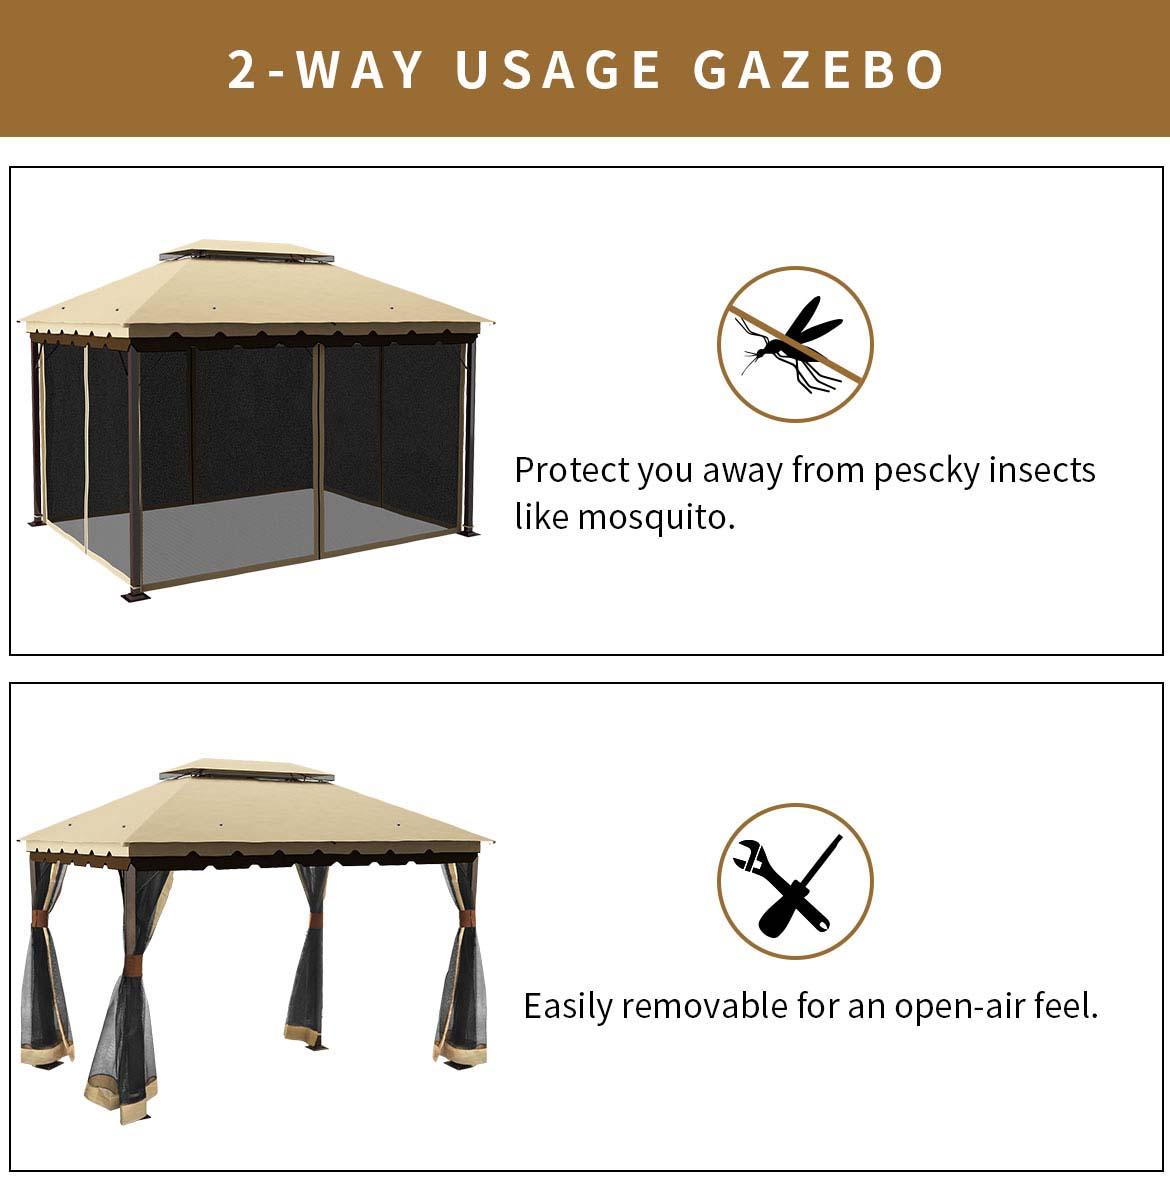 2-way usage 10x13 gazebo with netting